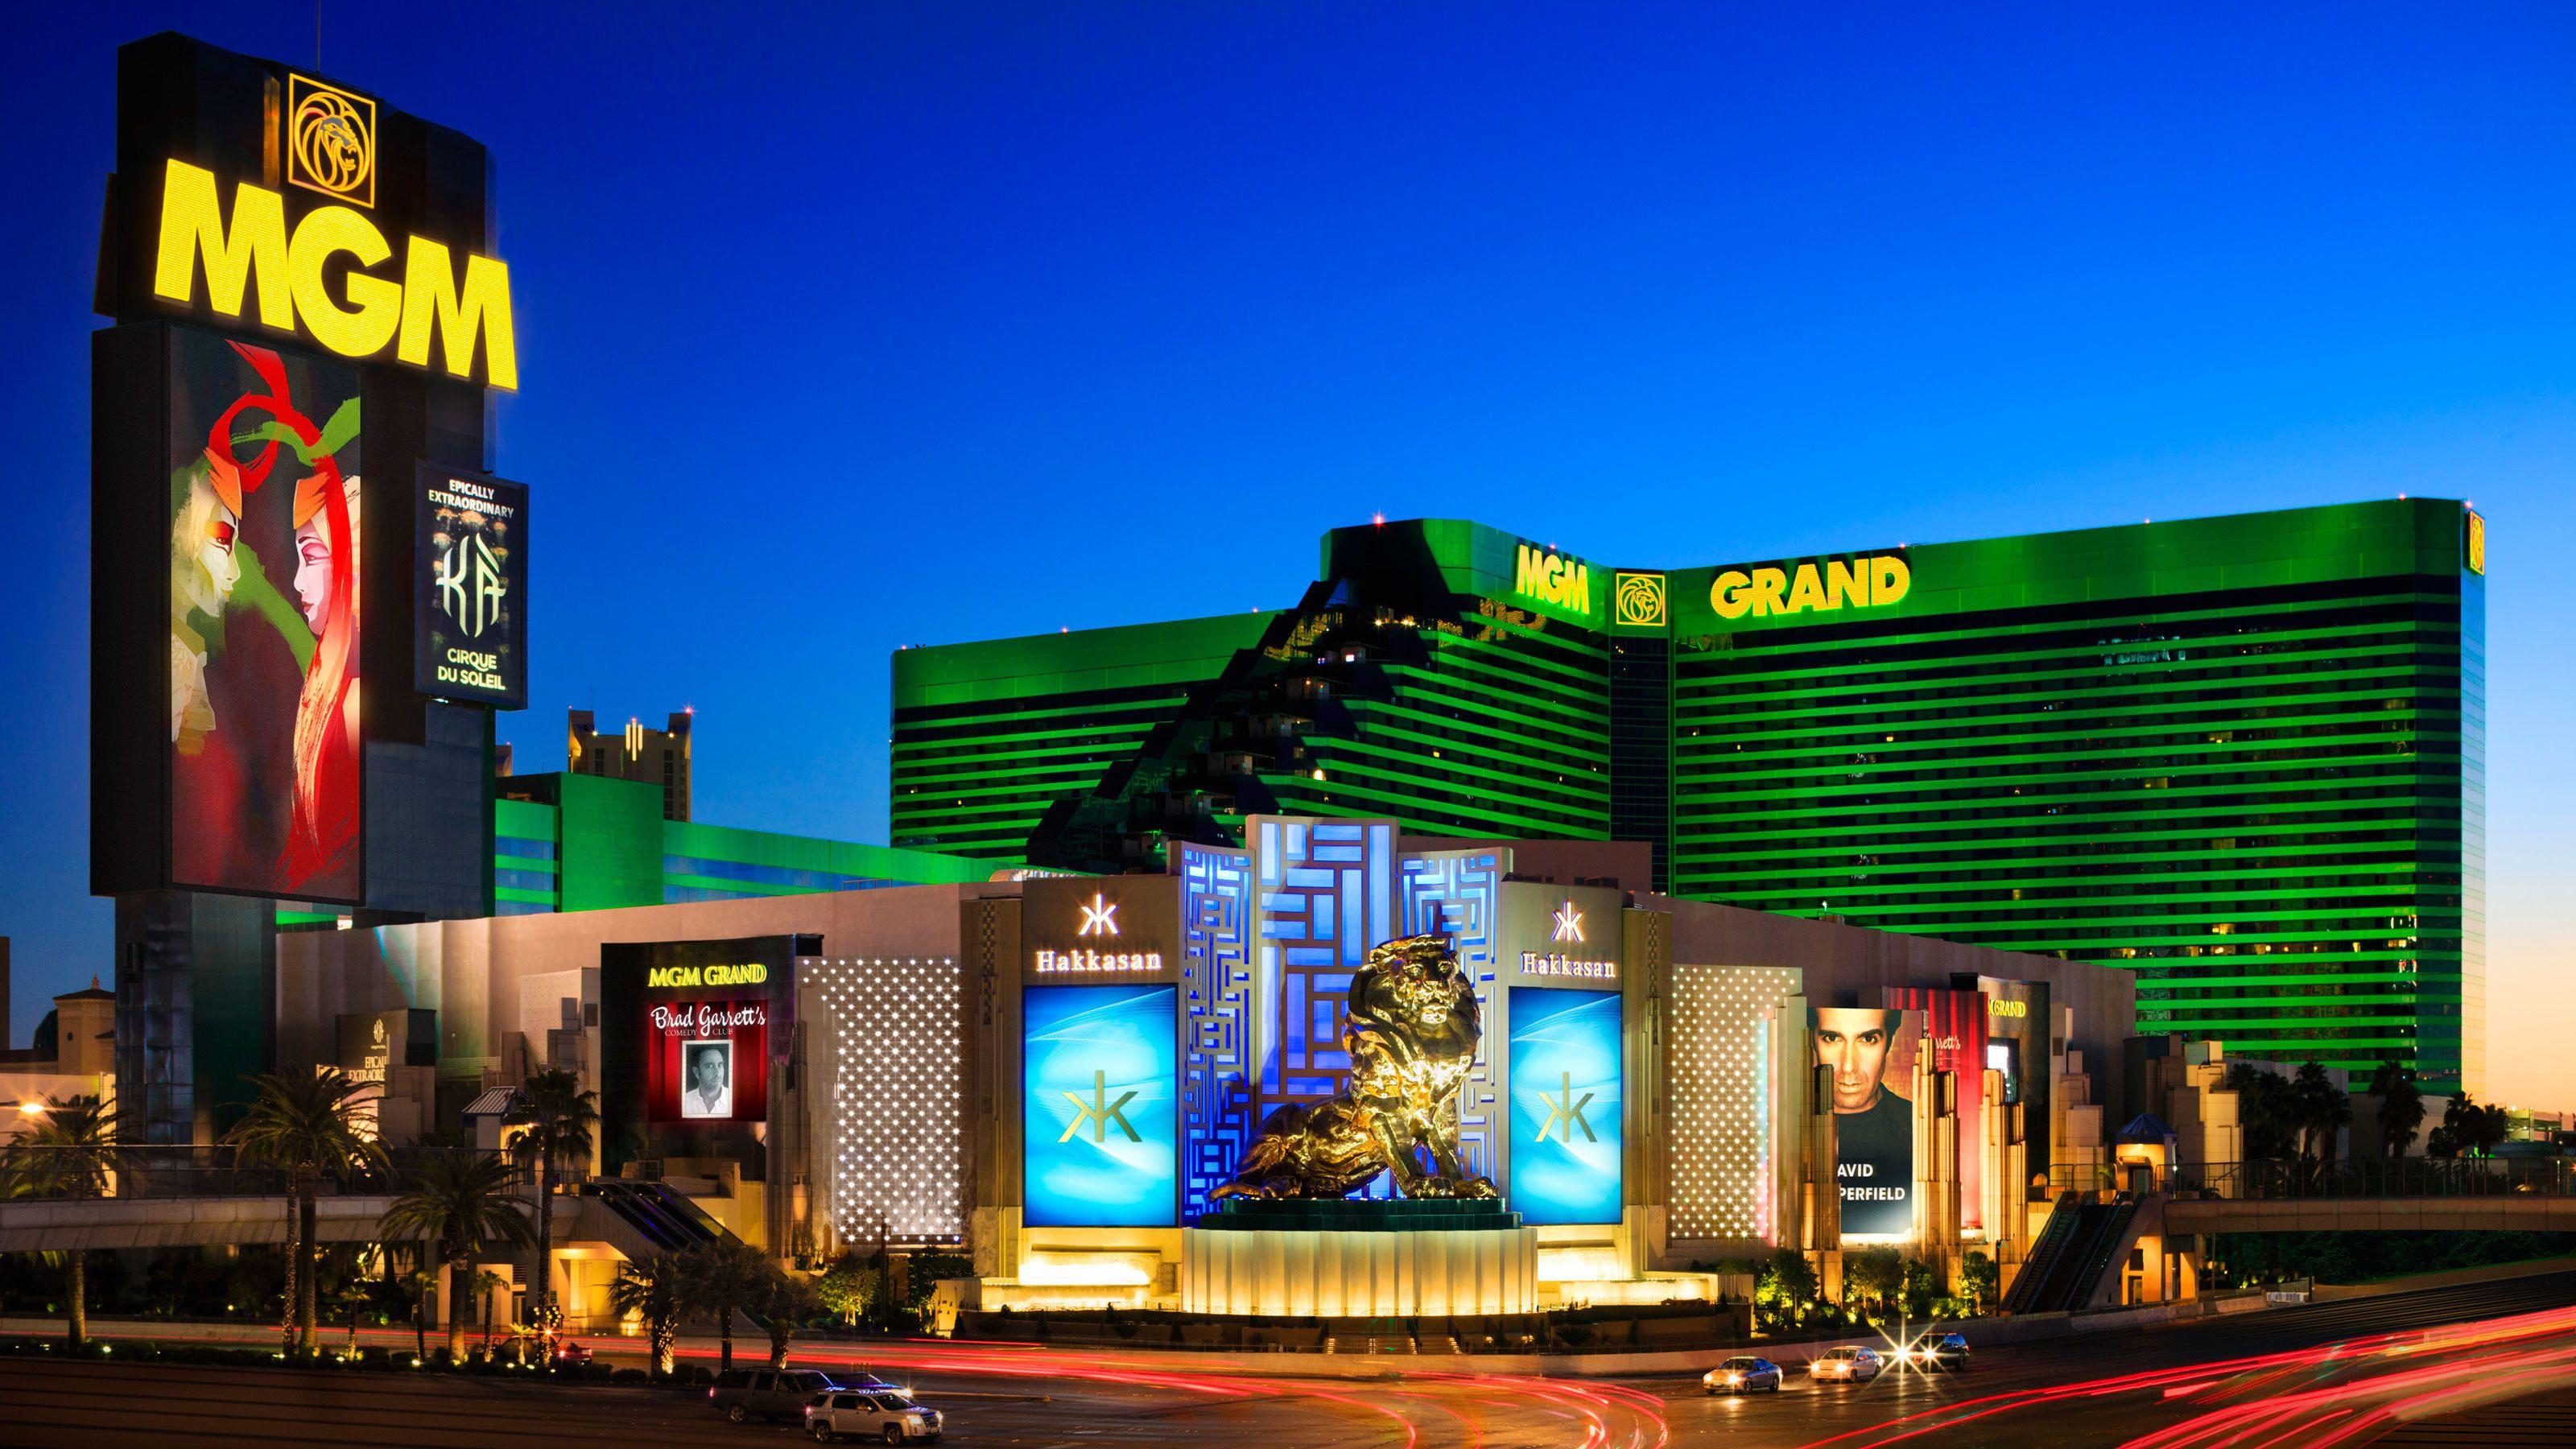 MGM Grand Las Vegas exterior view at sunset